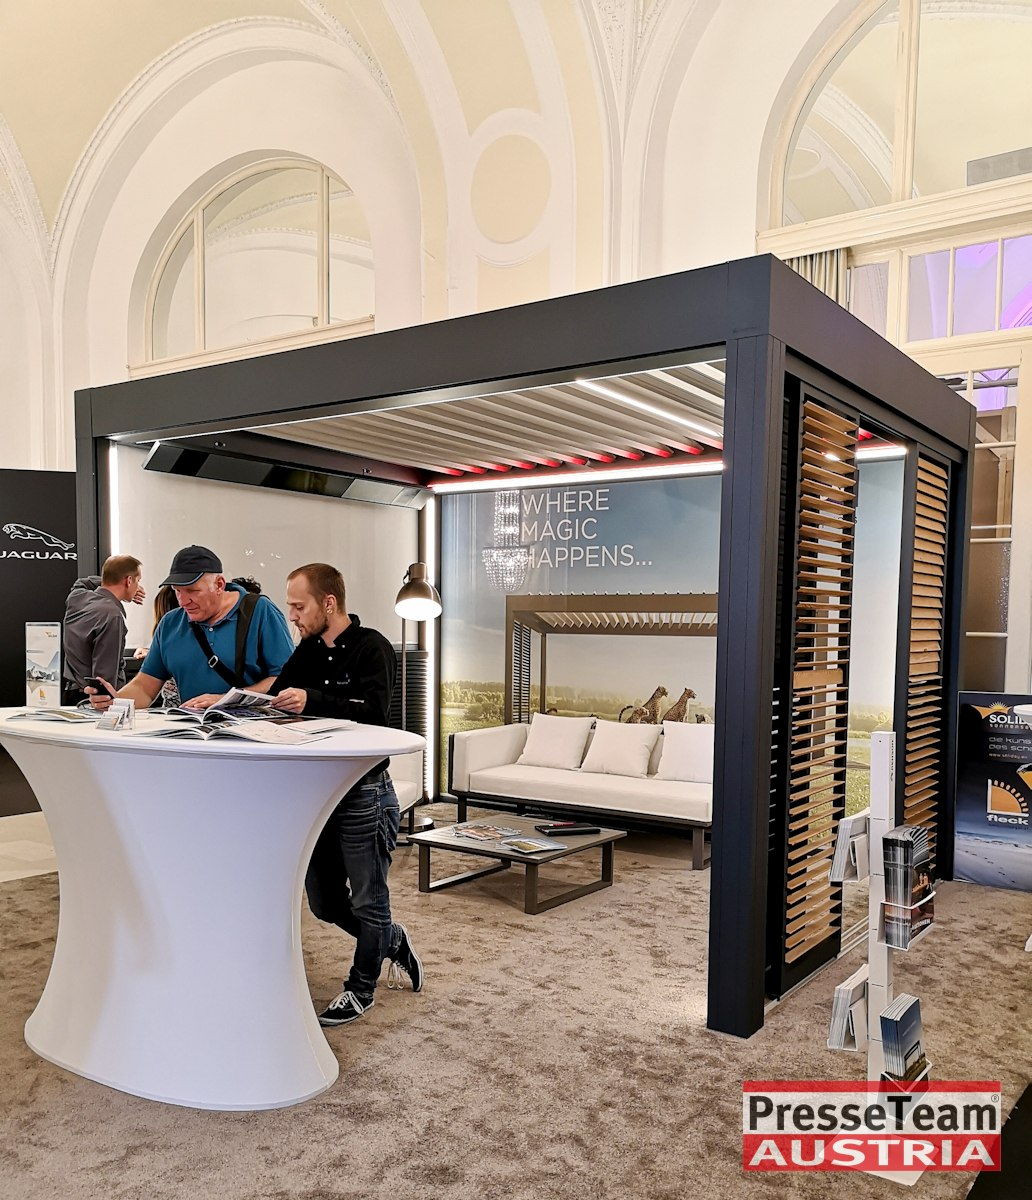 Messe Hofburg Wien 124 - Luxus Möbelmesse & Lifestyle in der Hofburg Wien